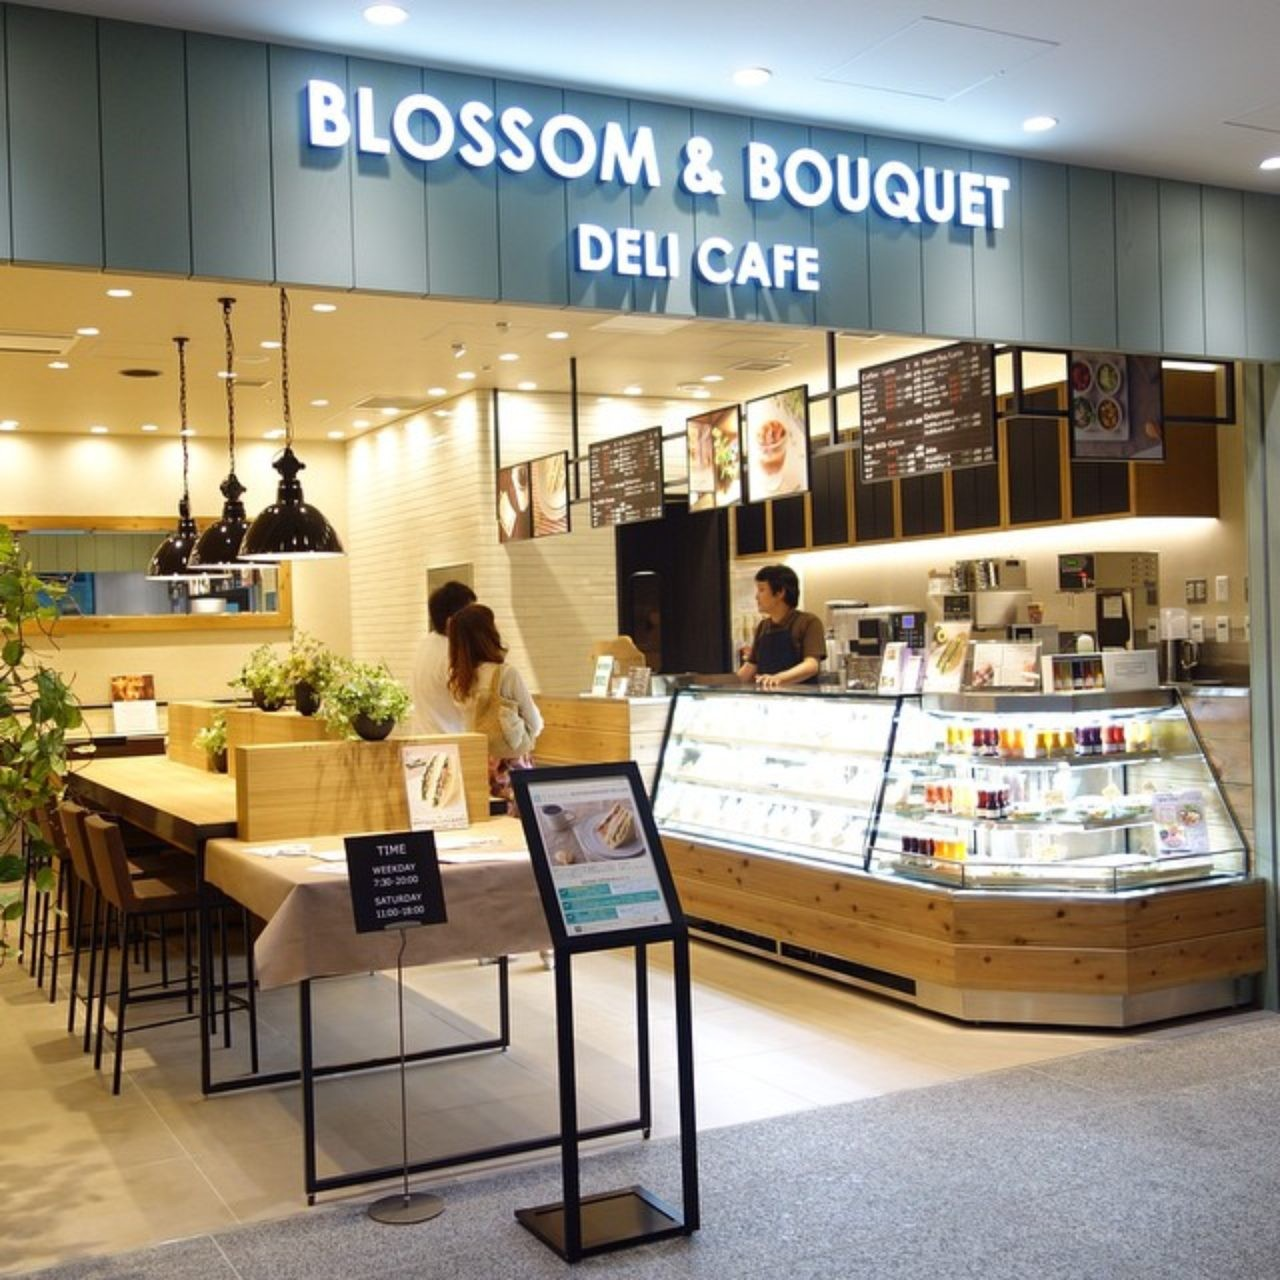 BLOSSOM & BOUQUET(ブロッサムアンドブーケ) DELI CAFE 品川店 カウンタースタッフ のアルバイト情報